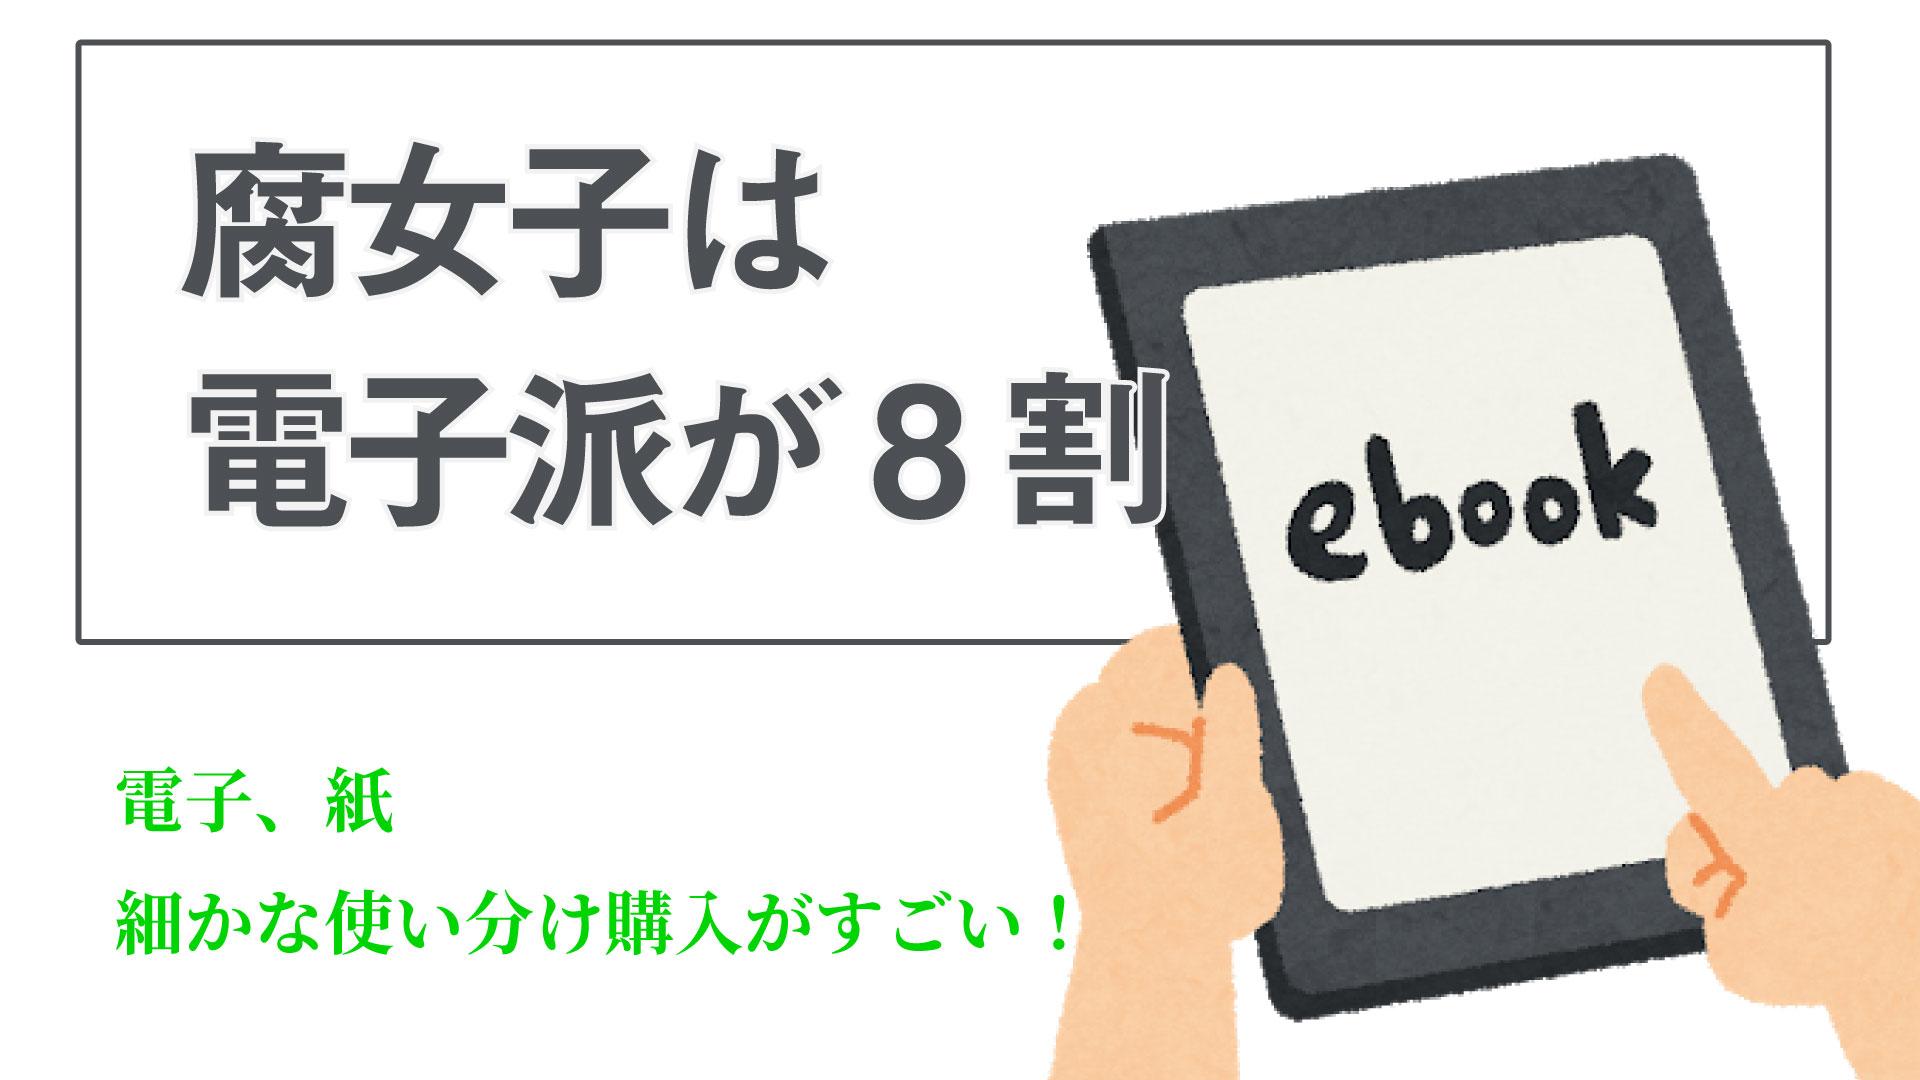 BLは電子or紙どっち派?アンケート結果が興味深い!表紙買いの時代は終わった!?